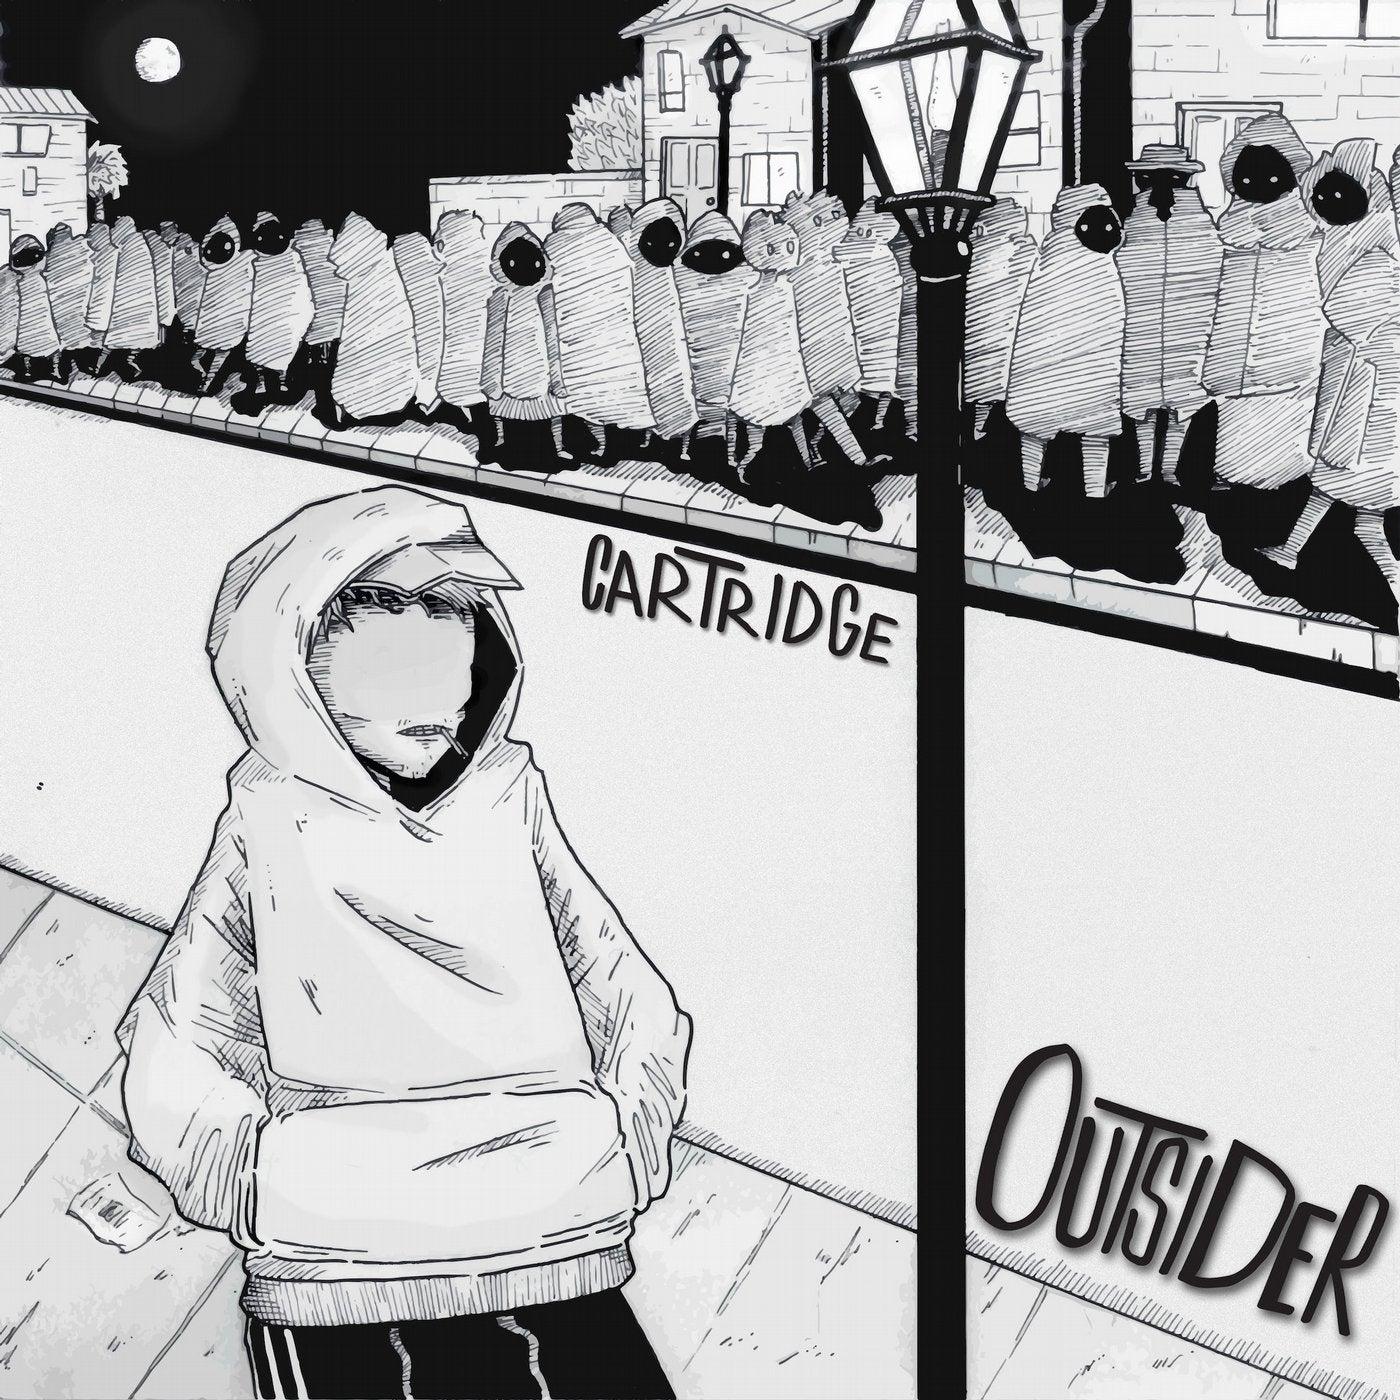 Outsider (Original Mix)